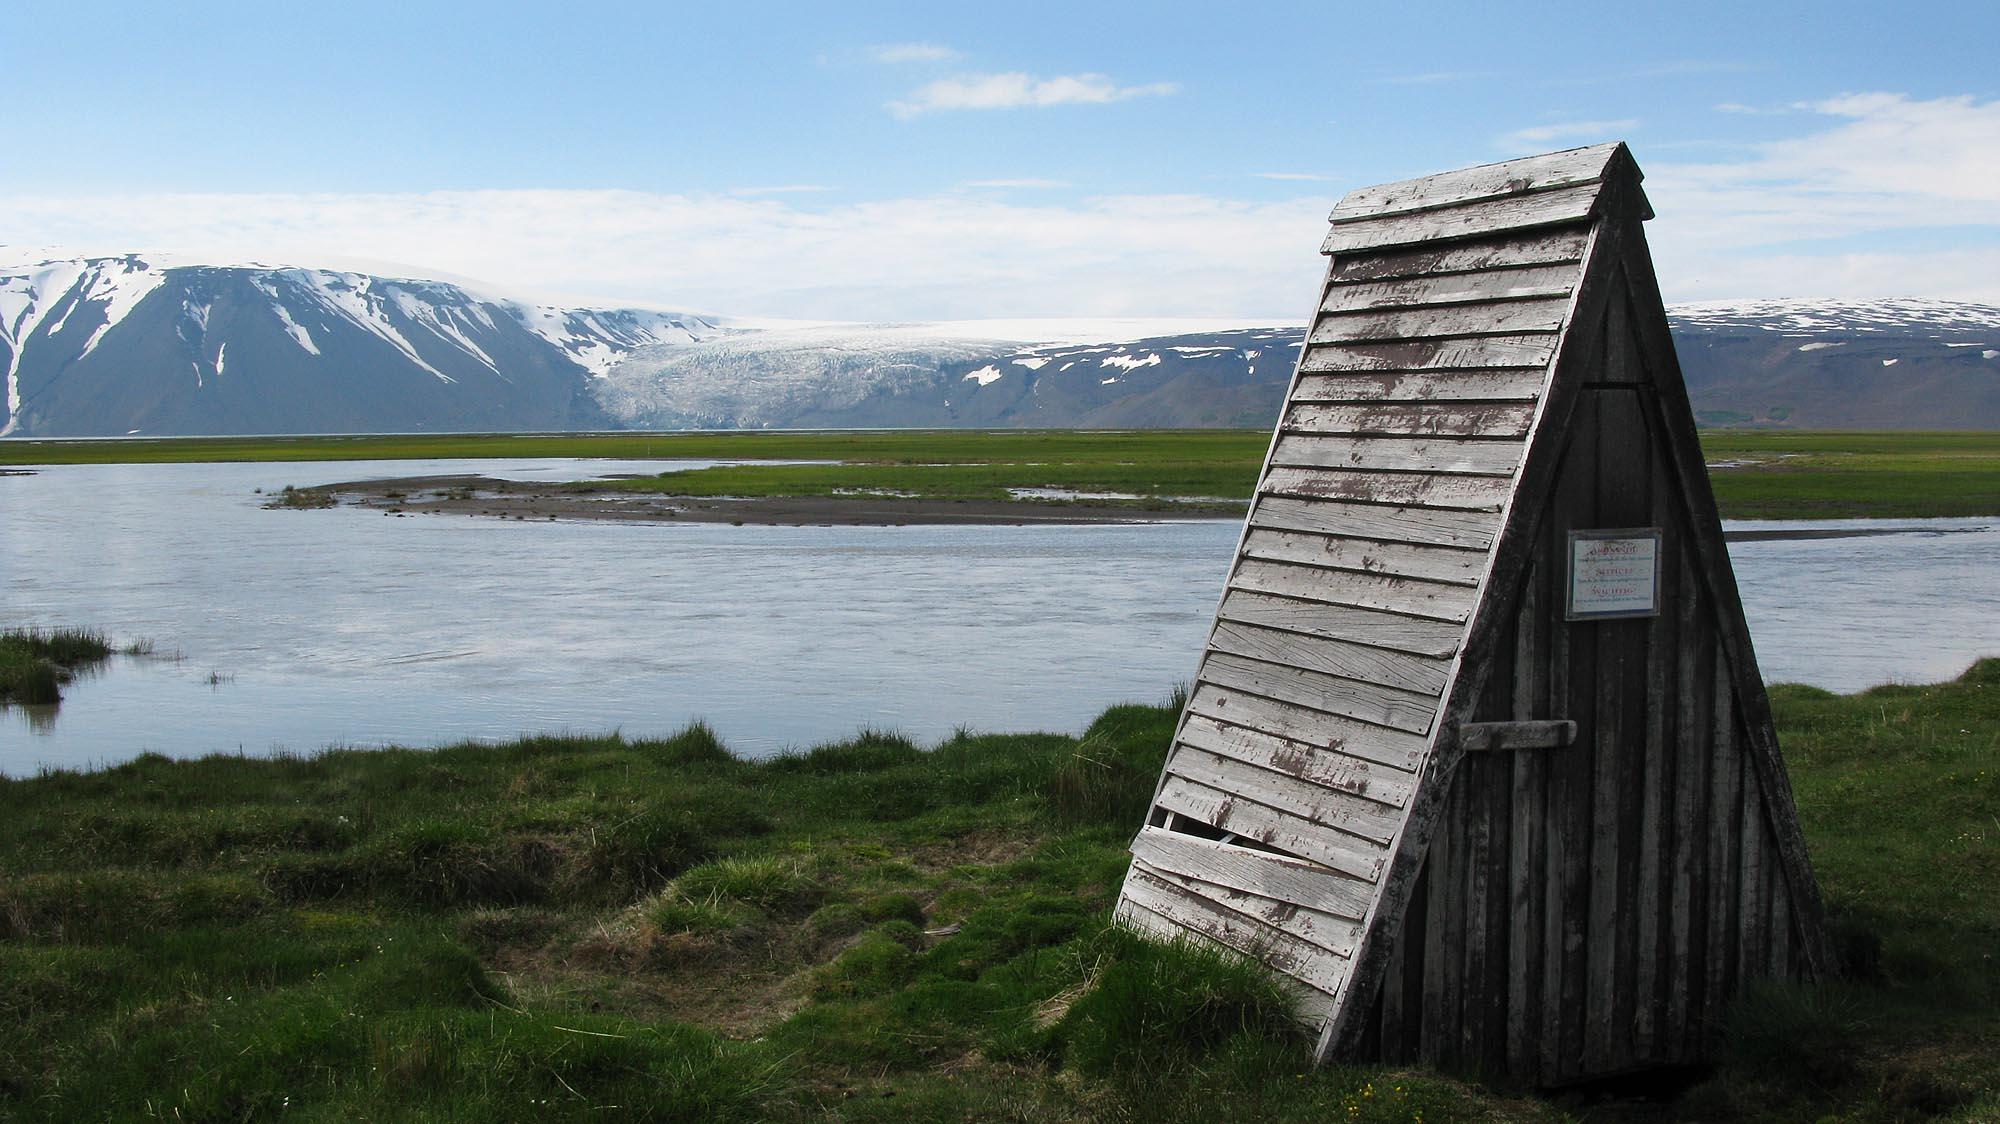 island-hrvatn-huette-small